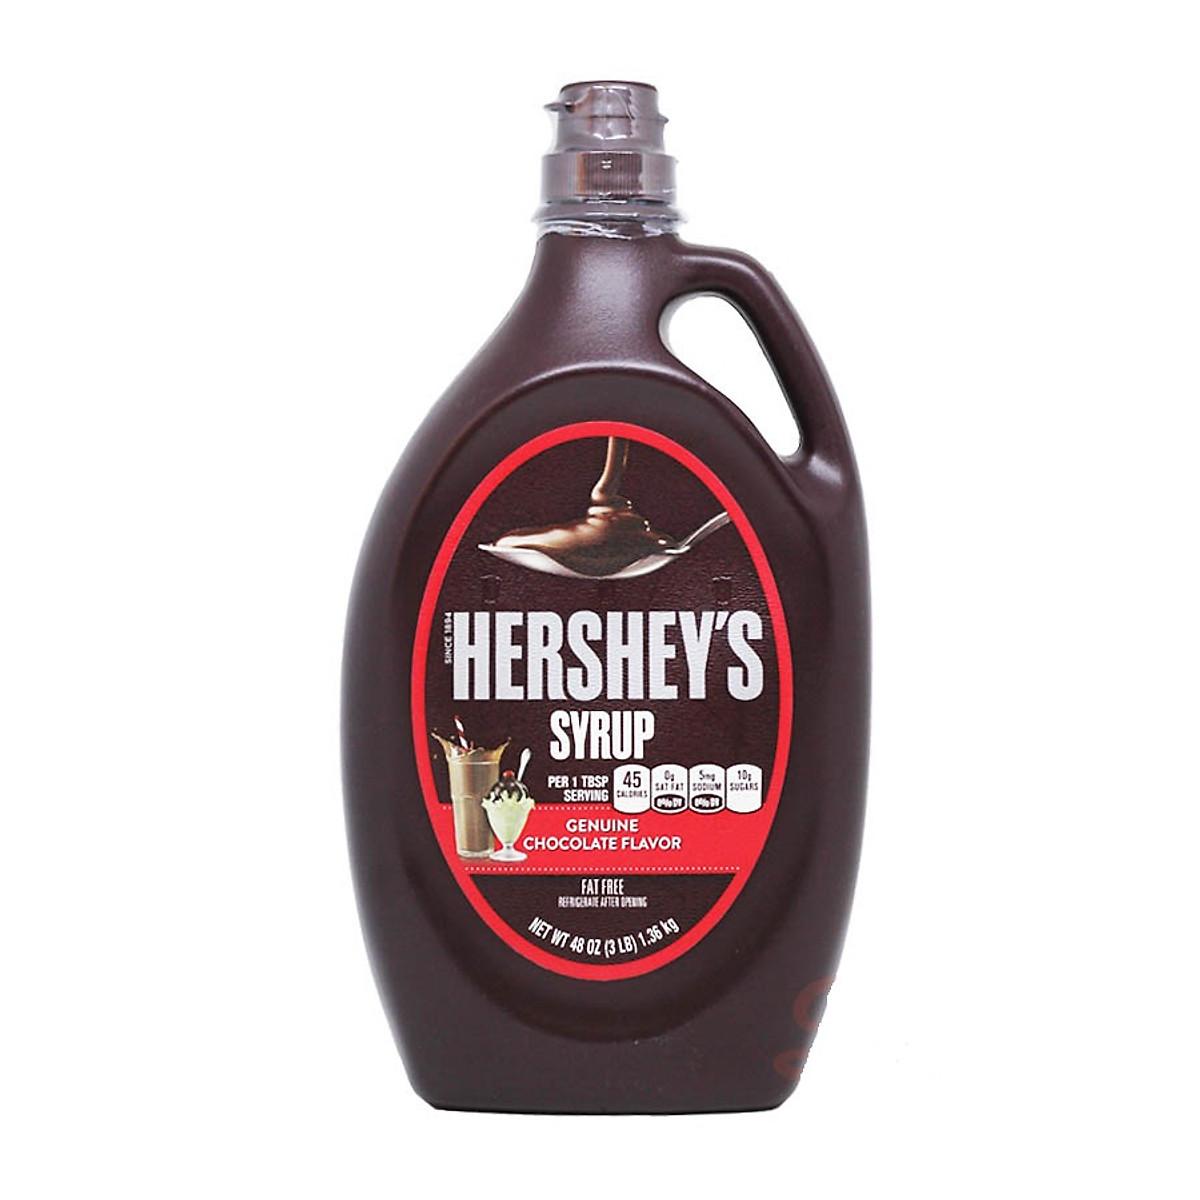 Sirô Hershey's Syrup Chocolate 1.36kg/Can